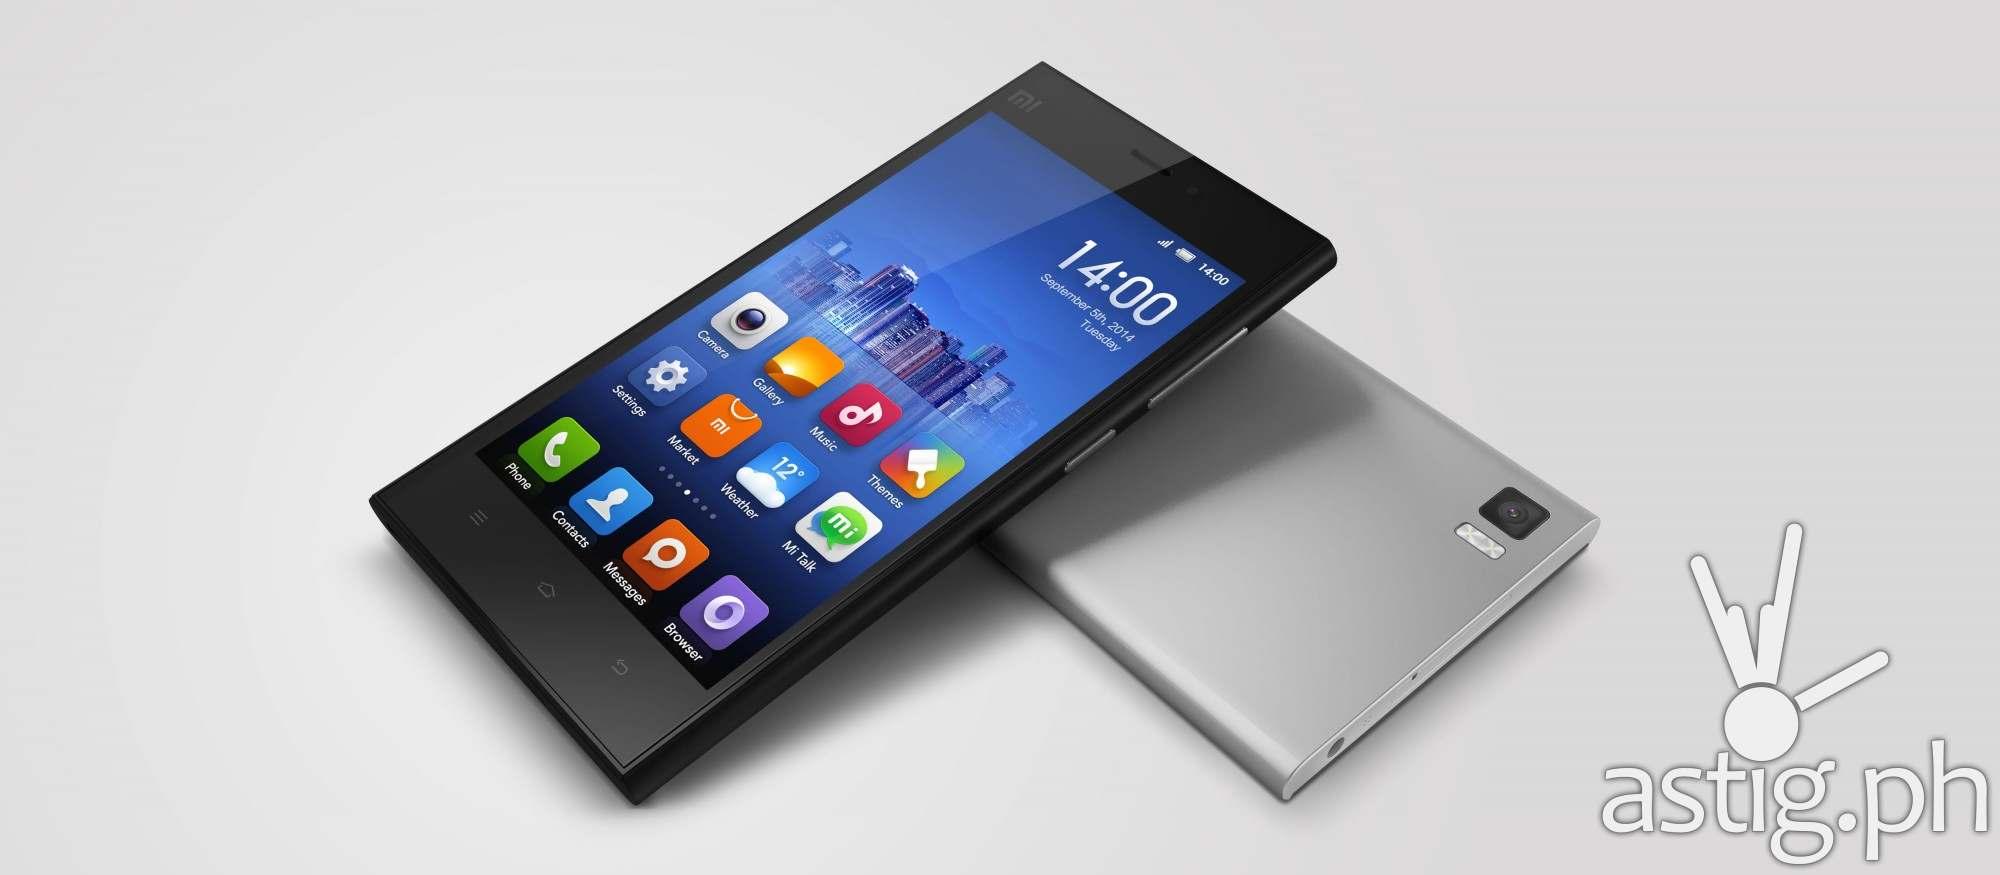 Xiaomi Mi 3 Android smartphone